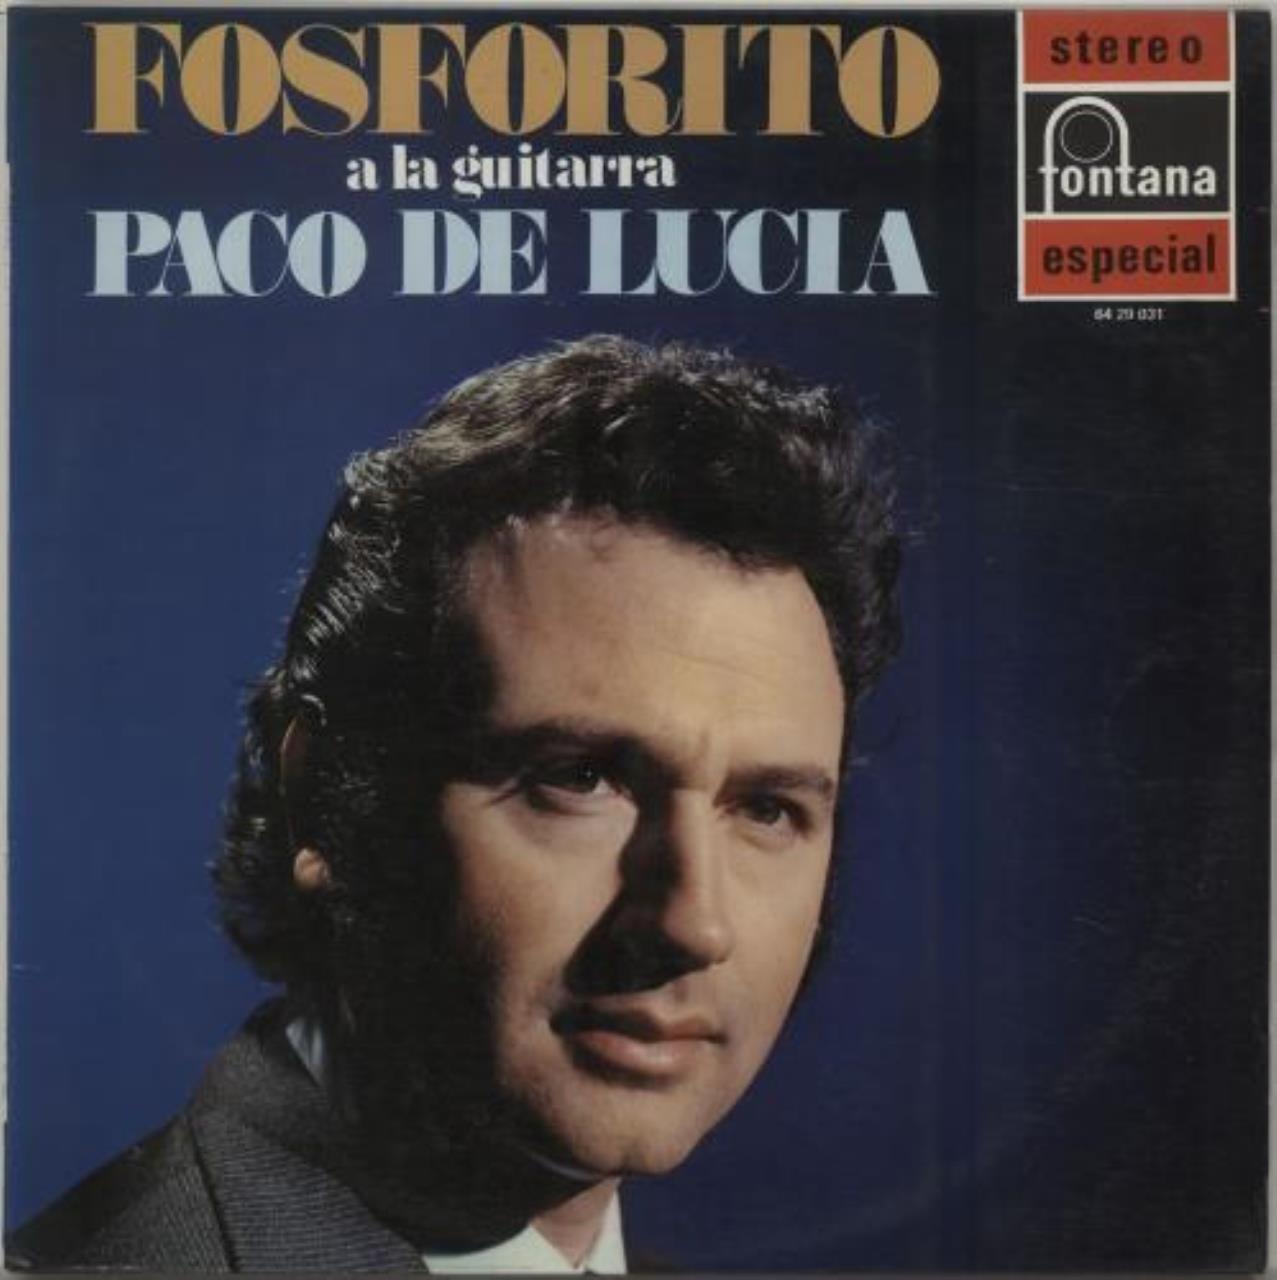 Fosforito A La Guitarra Paco de Lucia: Fosforito: Amazon.es: Música